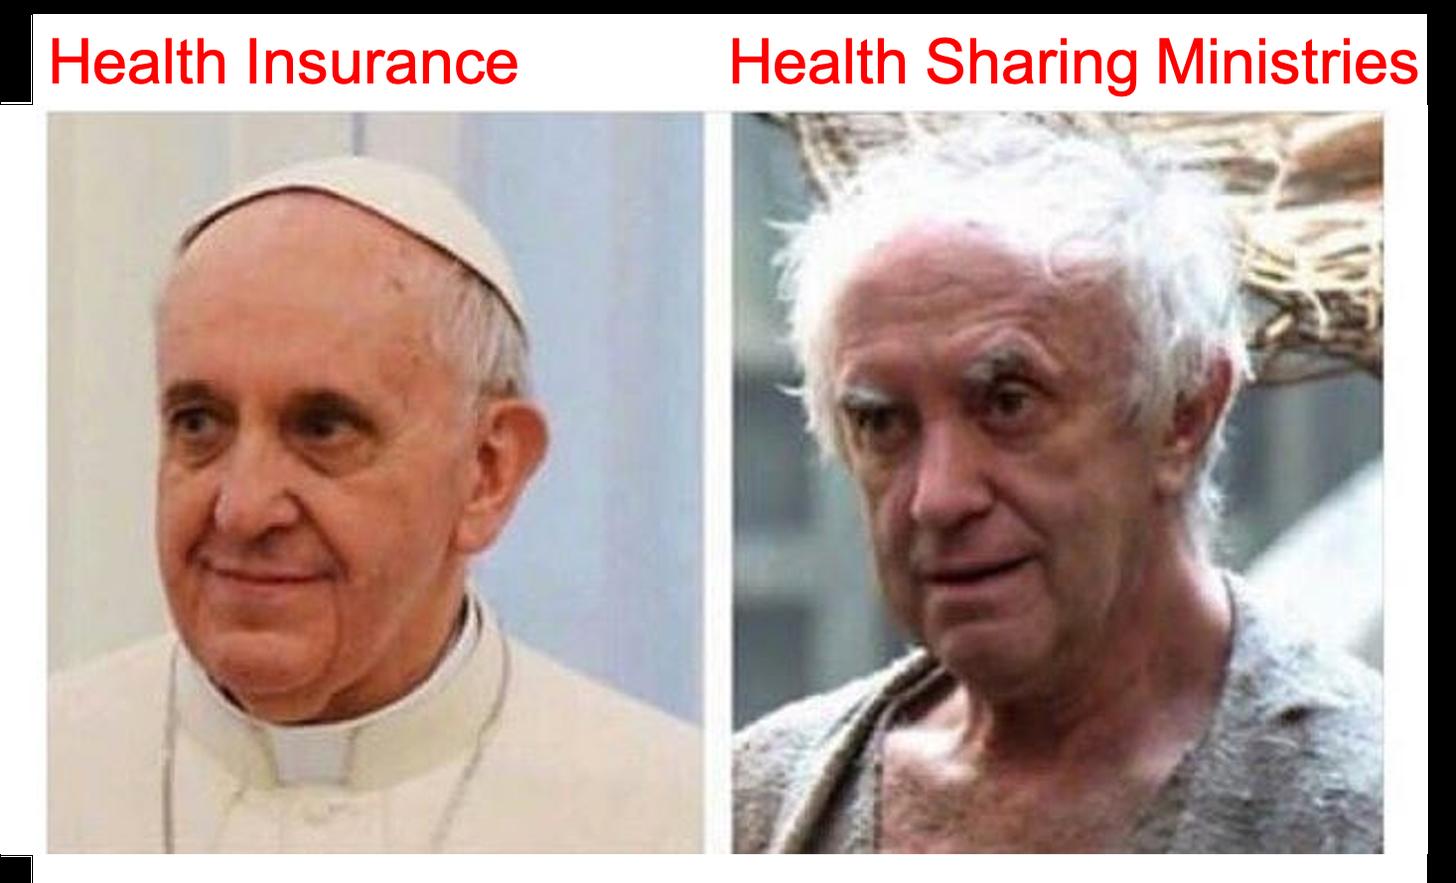 Christian Health Insurance